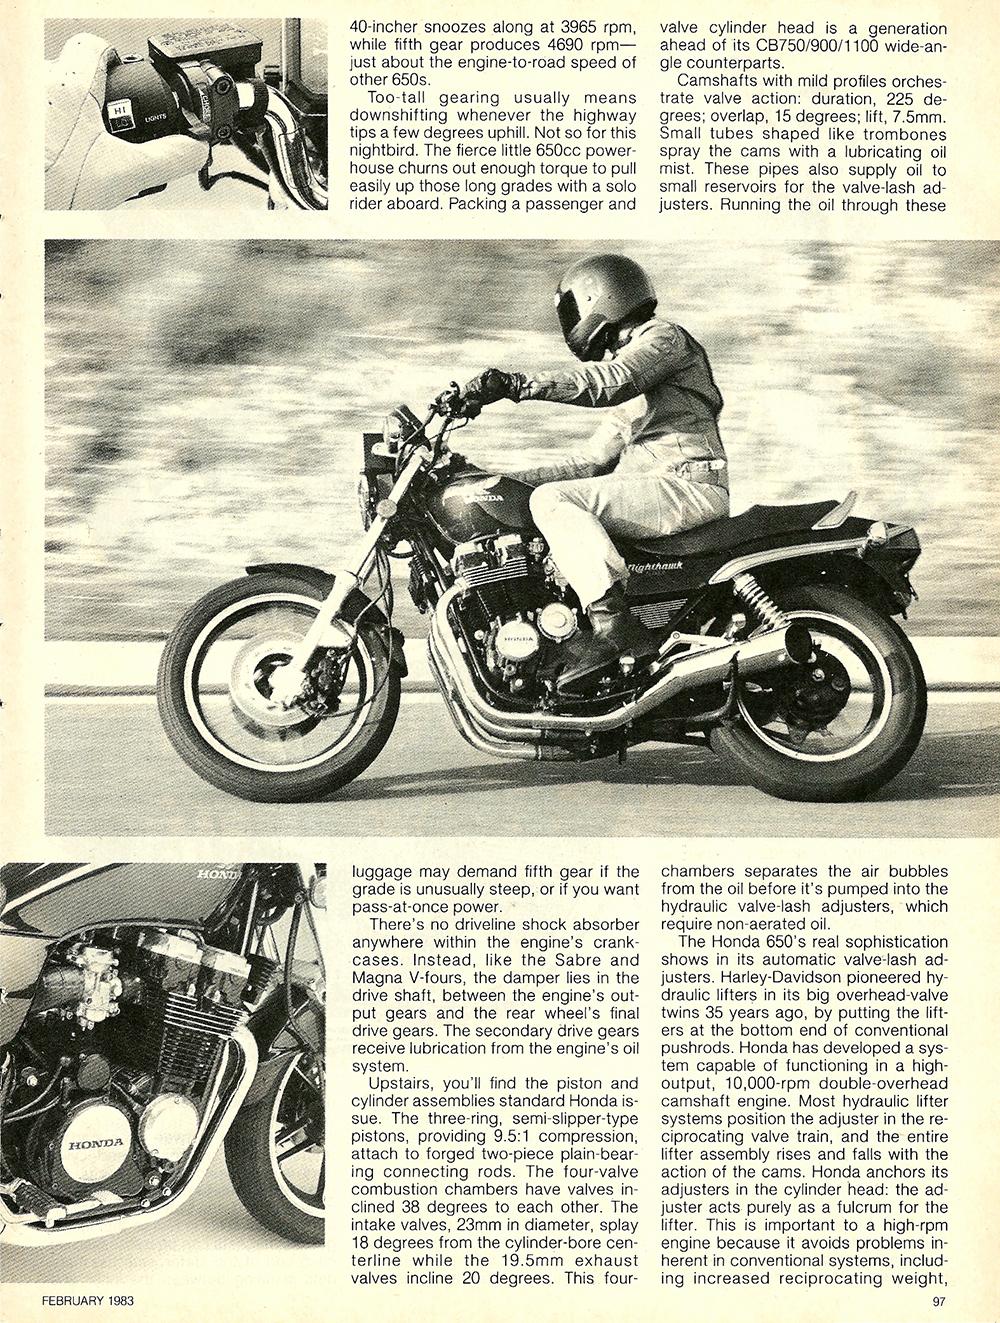 1983 Honda CB650SC Nighthawk road test 4.jpg